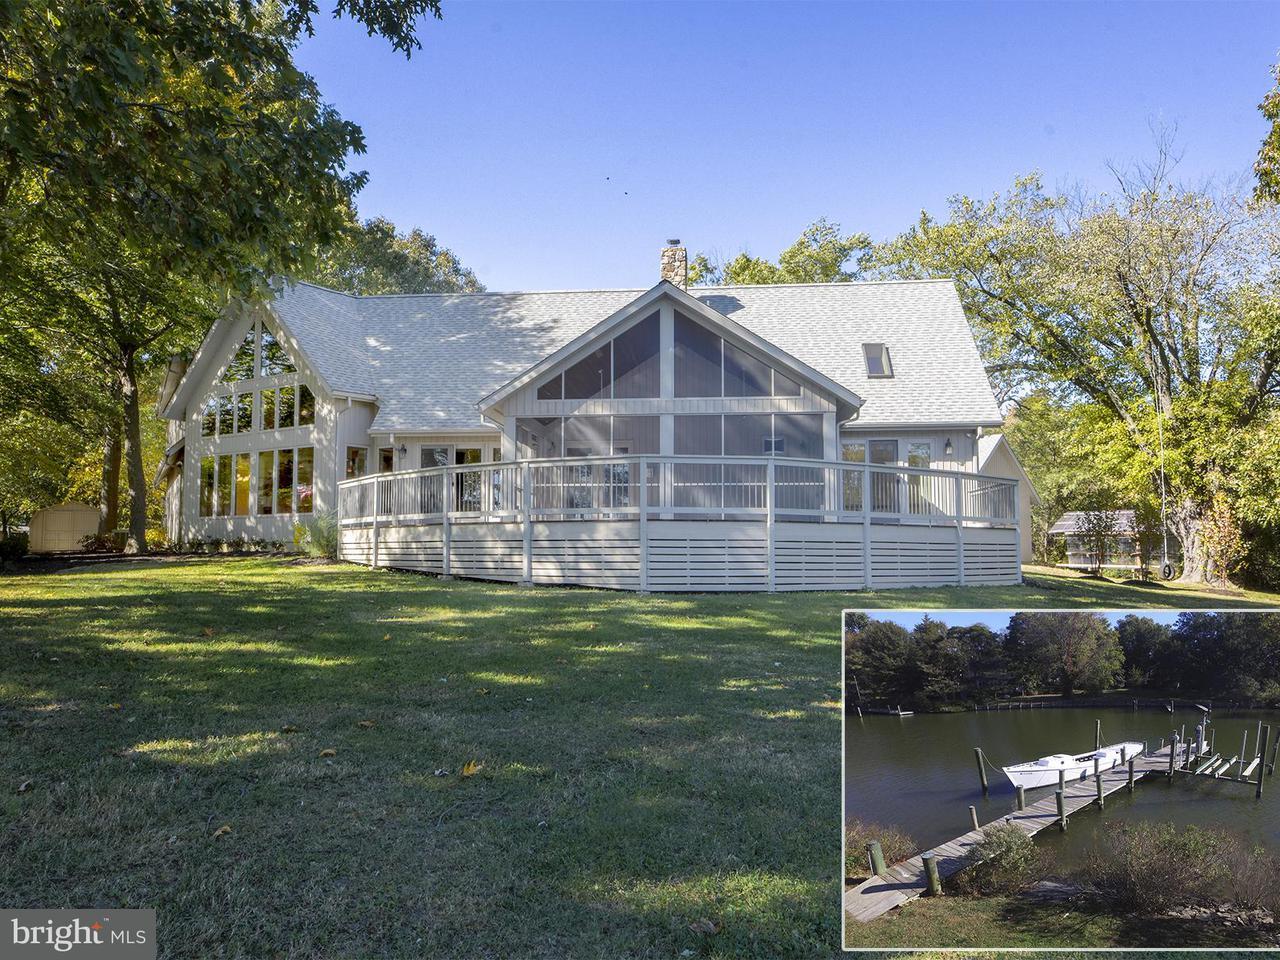 Casa Unifamiliar por un Venta en 4841 CHURCH Lane 4841 CHURCH Lane Galesville, Maryland 20765 Estados Unidos